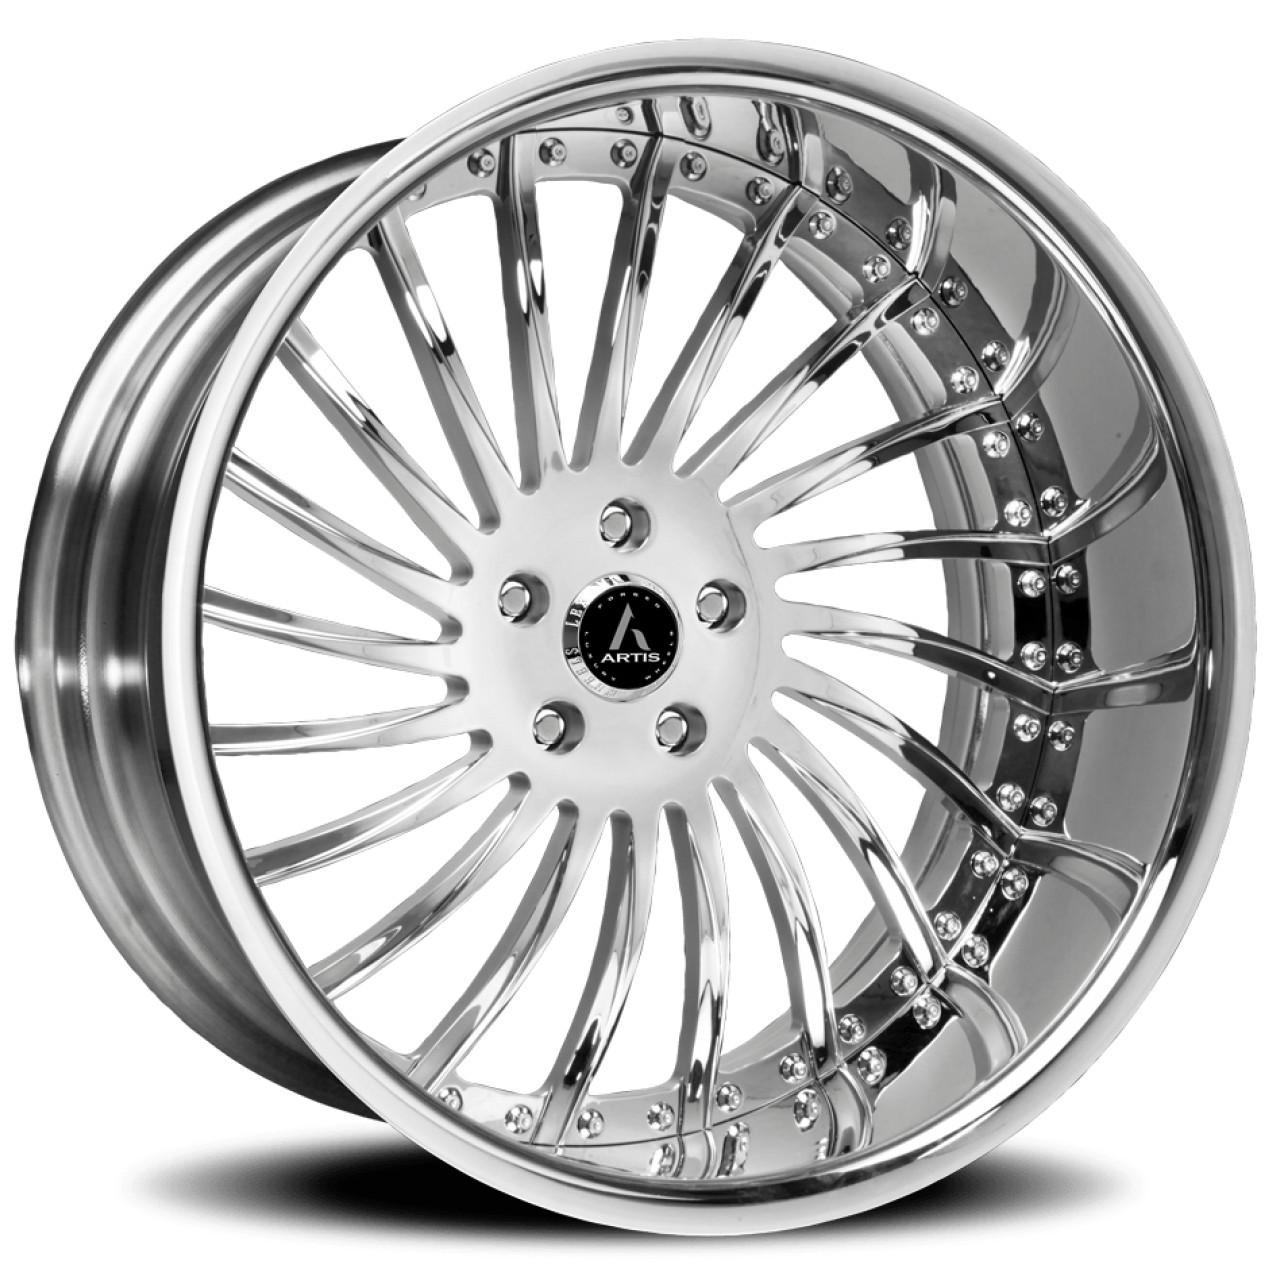 Artis International forged wheels